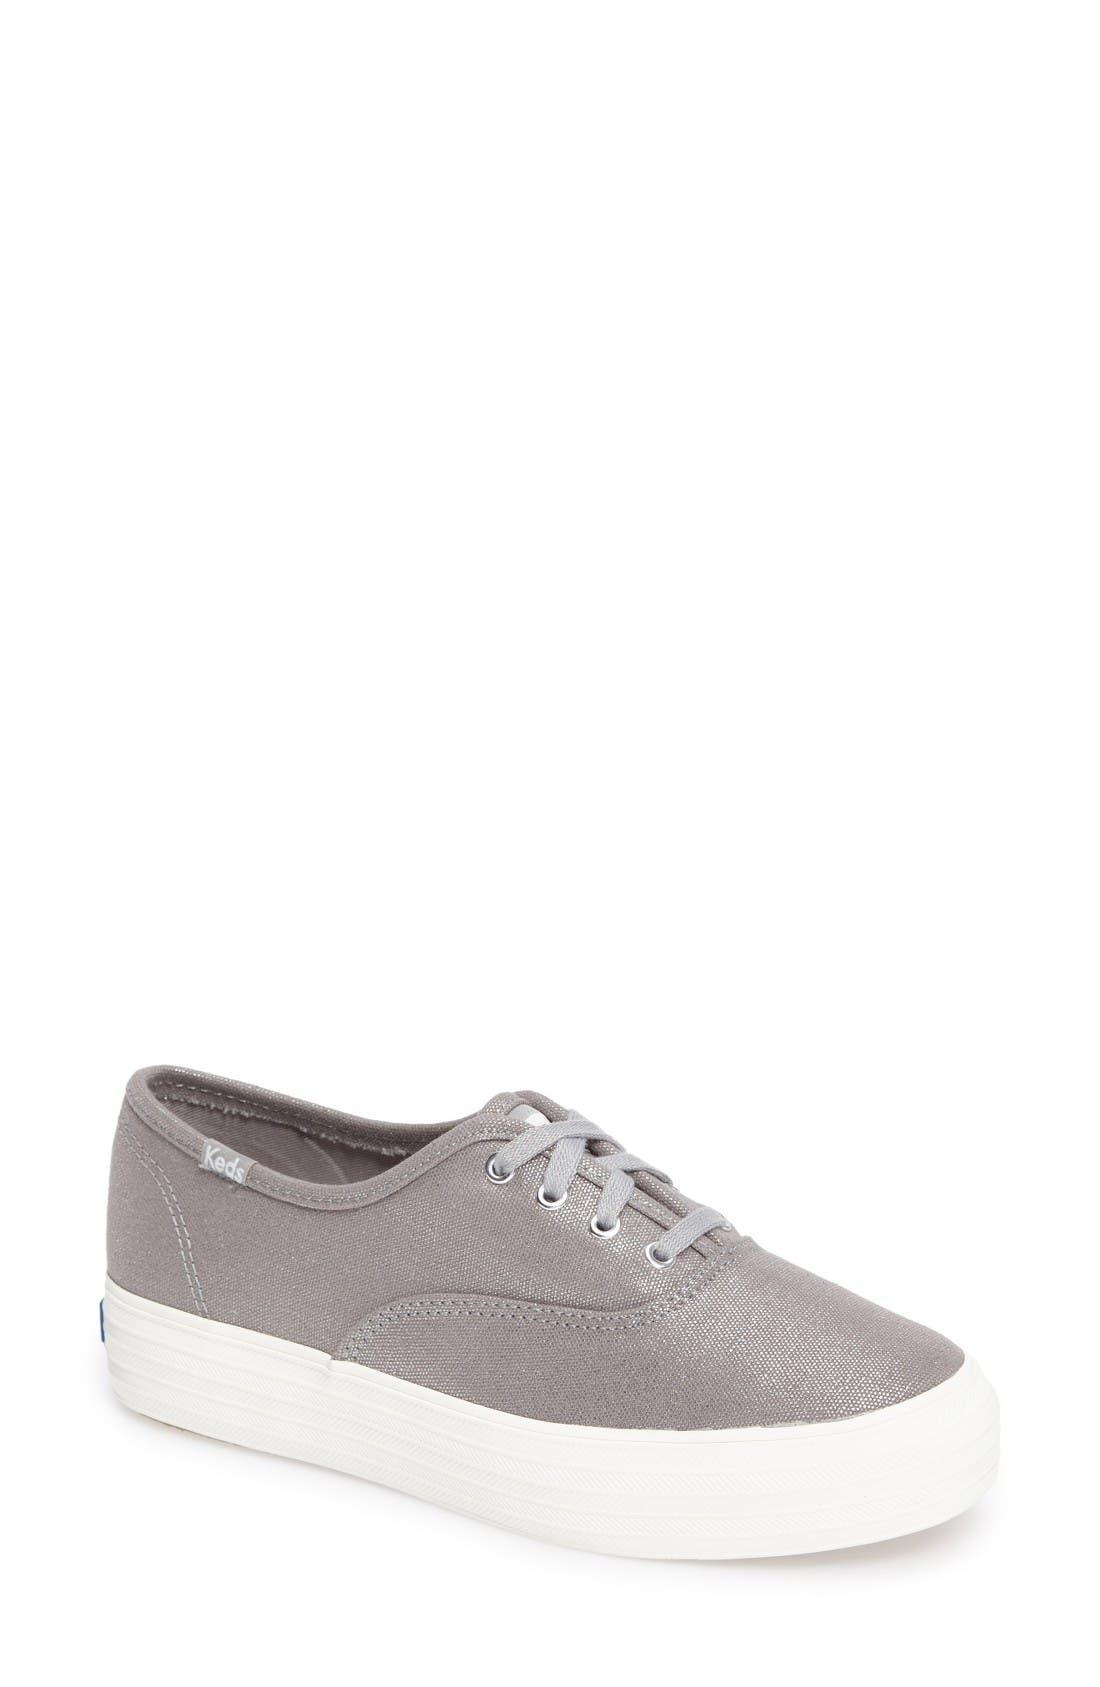 Main Image - Keds® Triple Deck Platform Sneaker (Women)